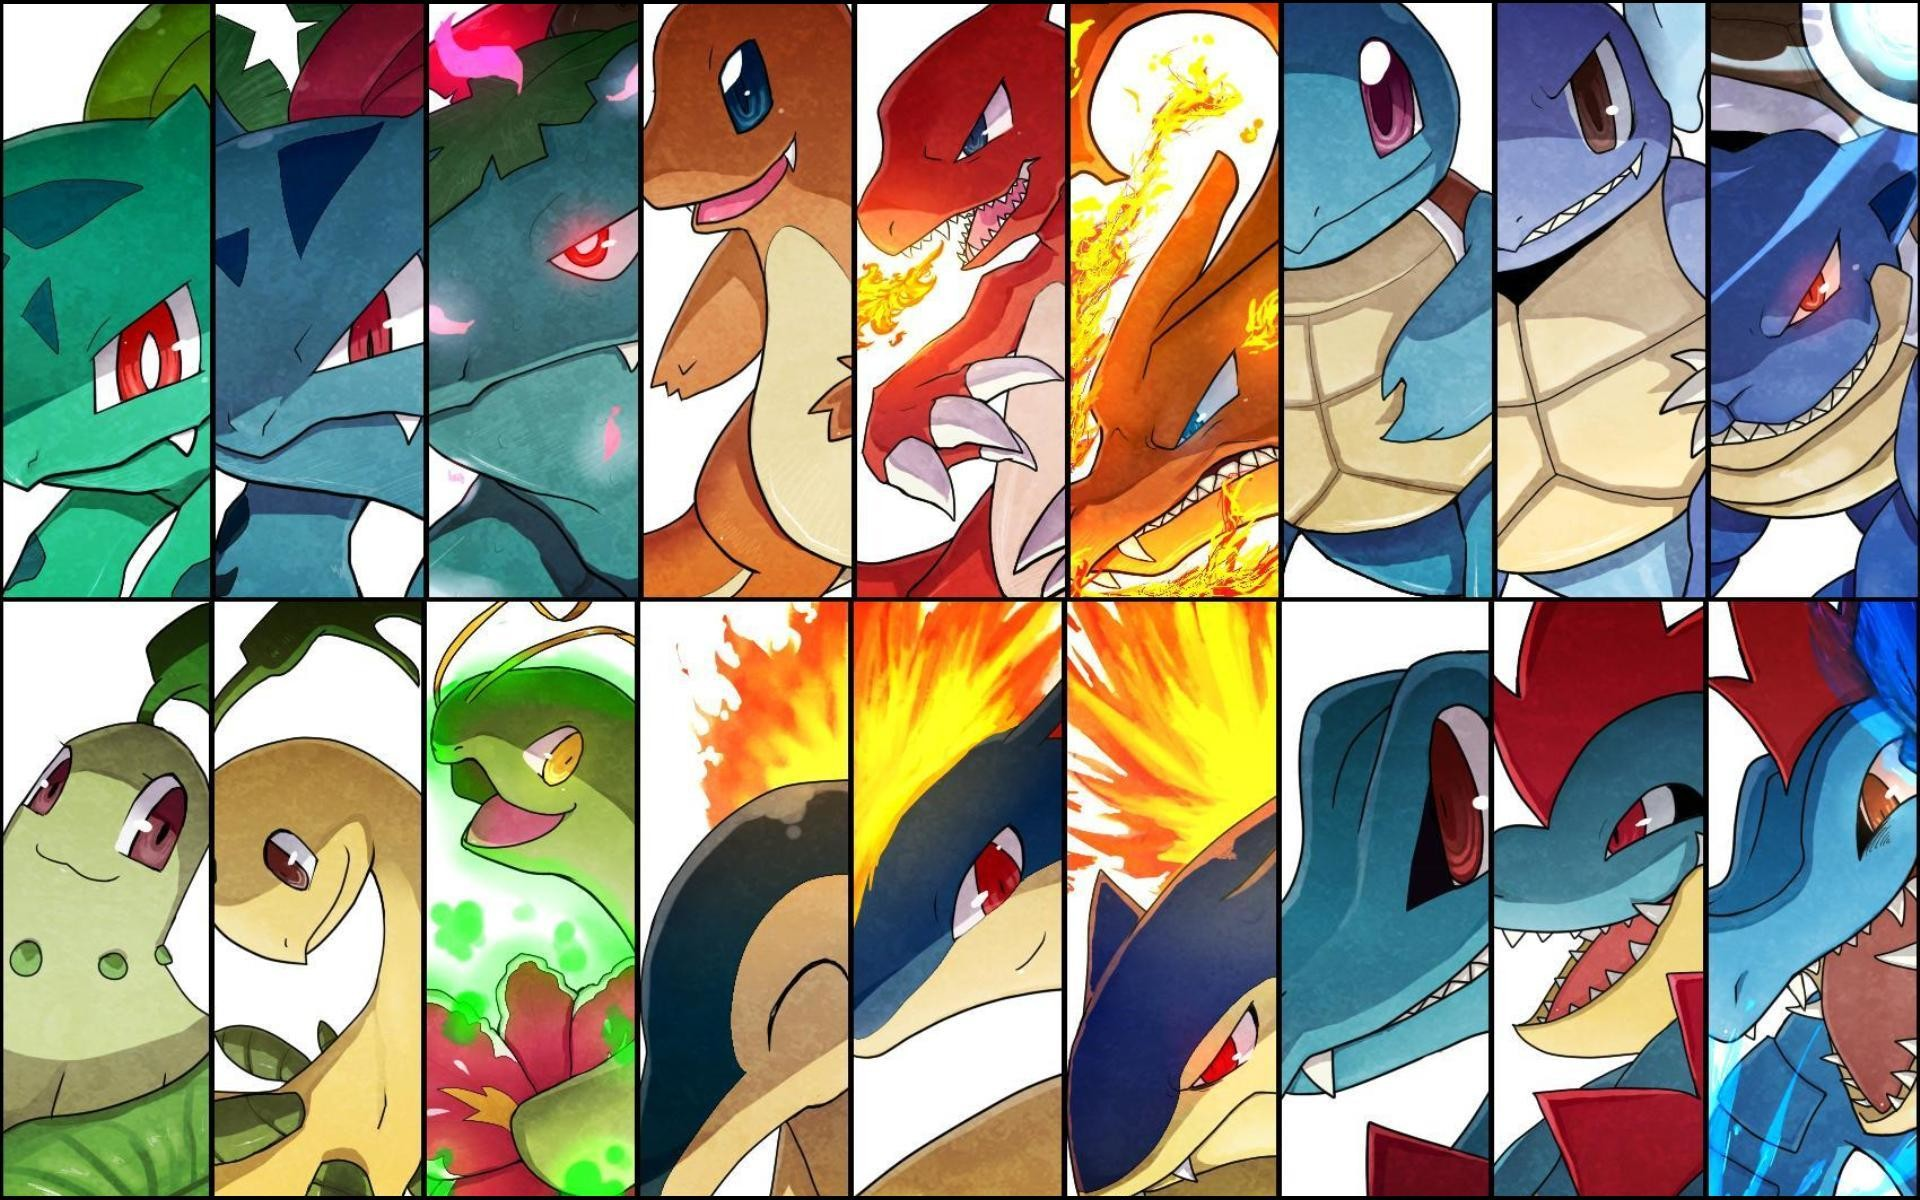 Some Pokémon Wallpapers